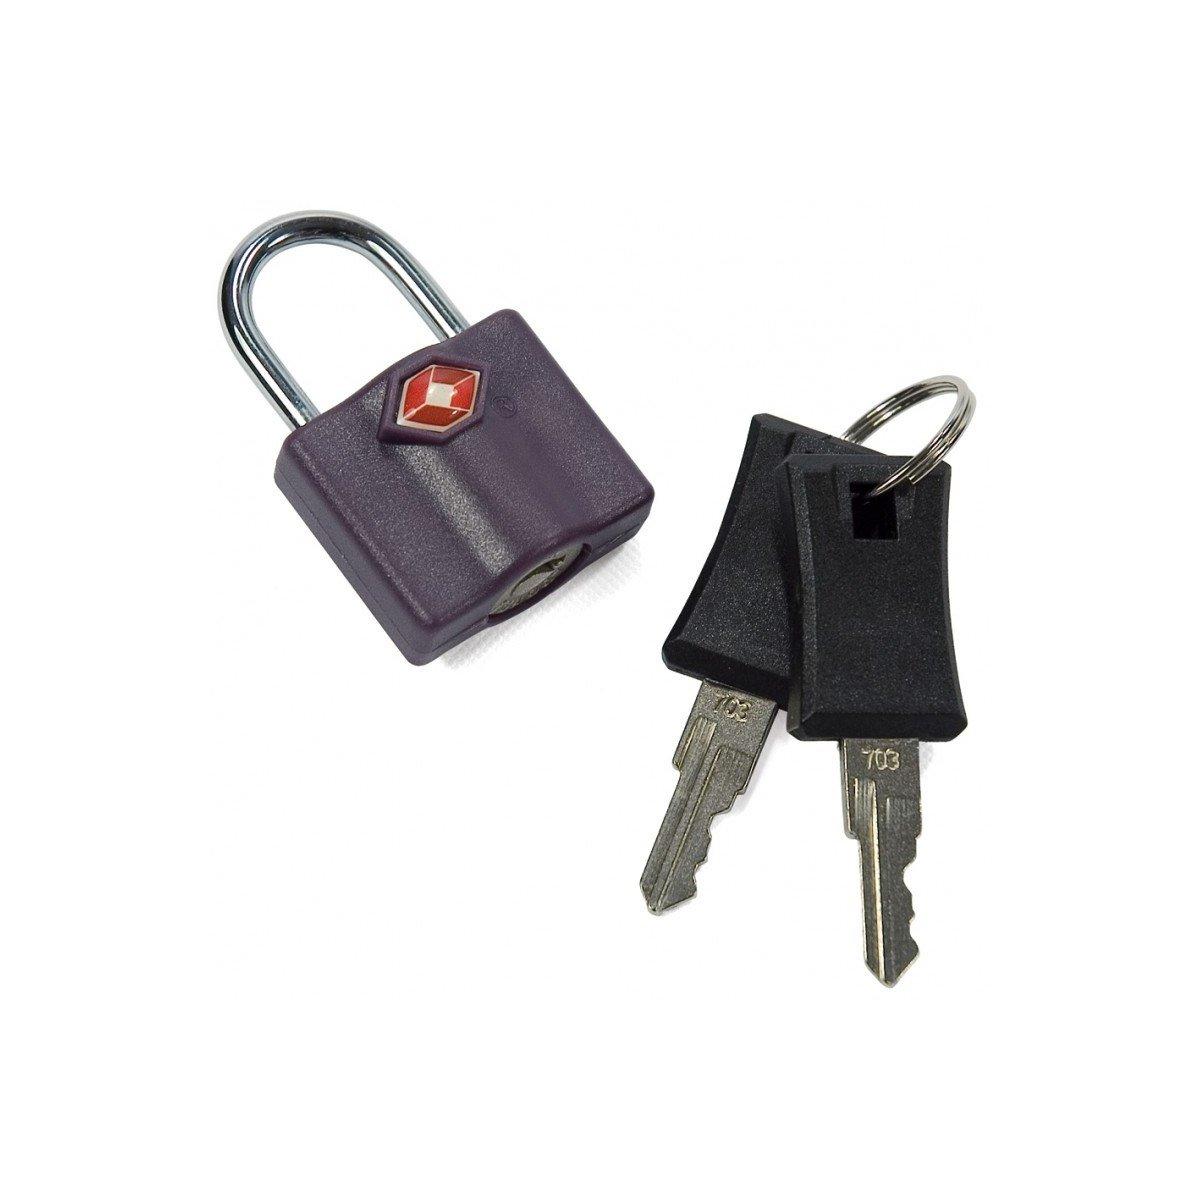 Benzi TSA Padlock Travel Security Lock: Amazon co uk: Luggage